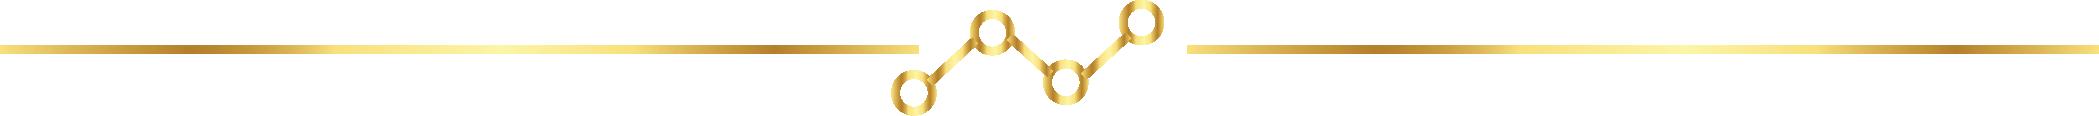 yellow border image